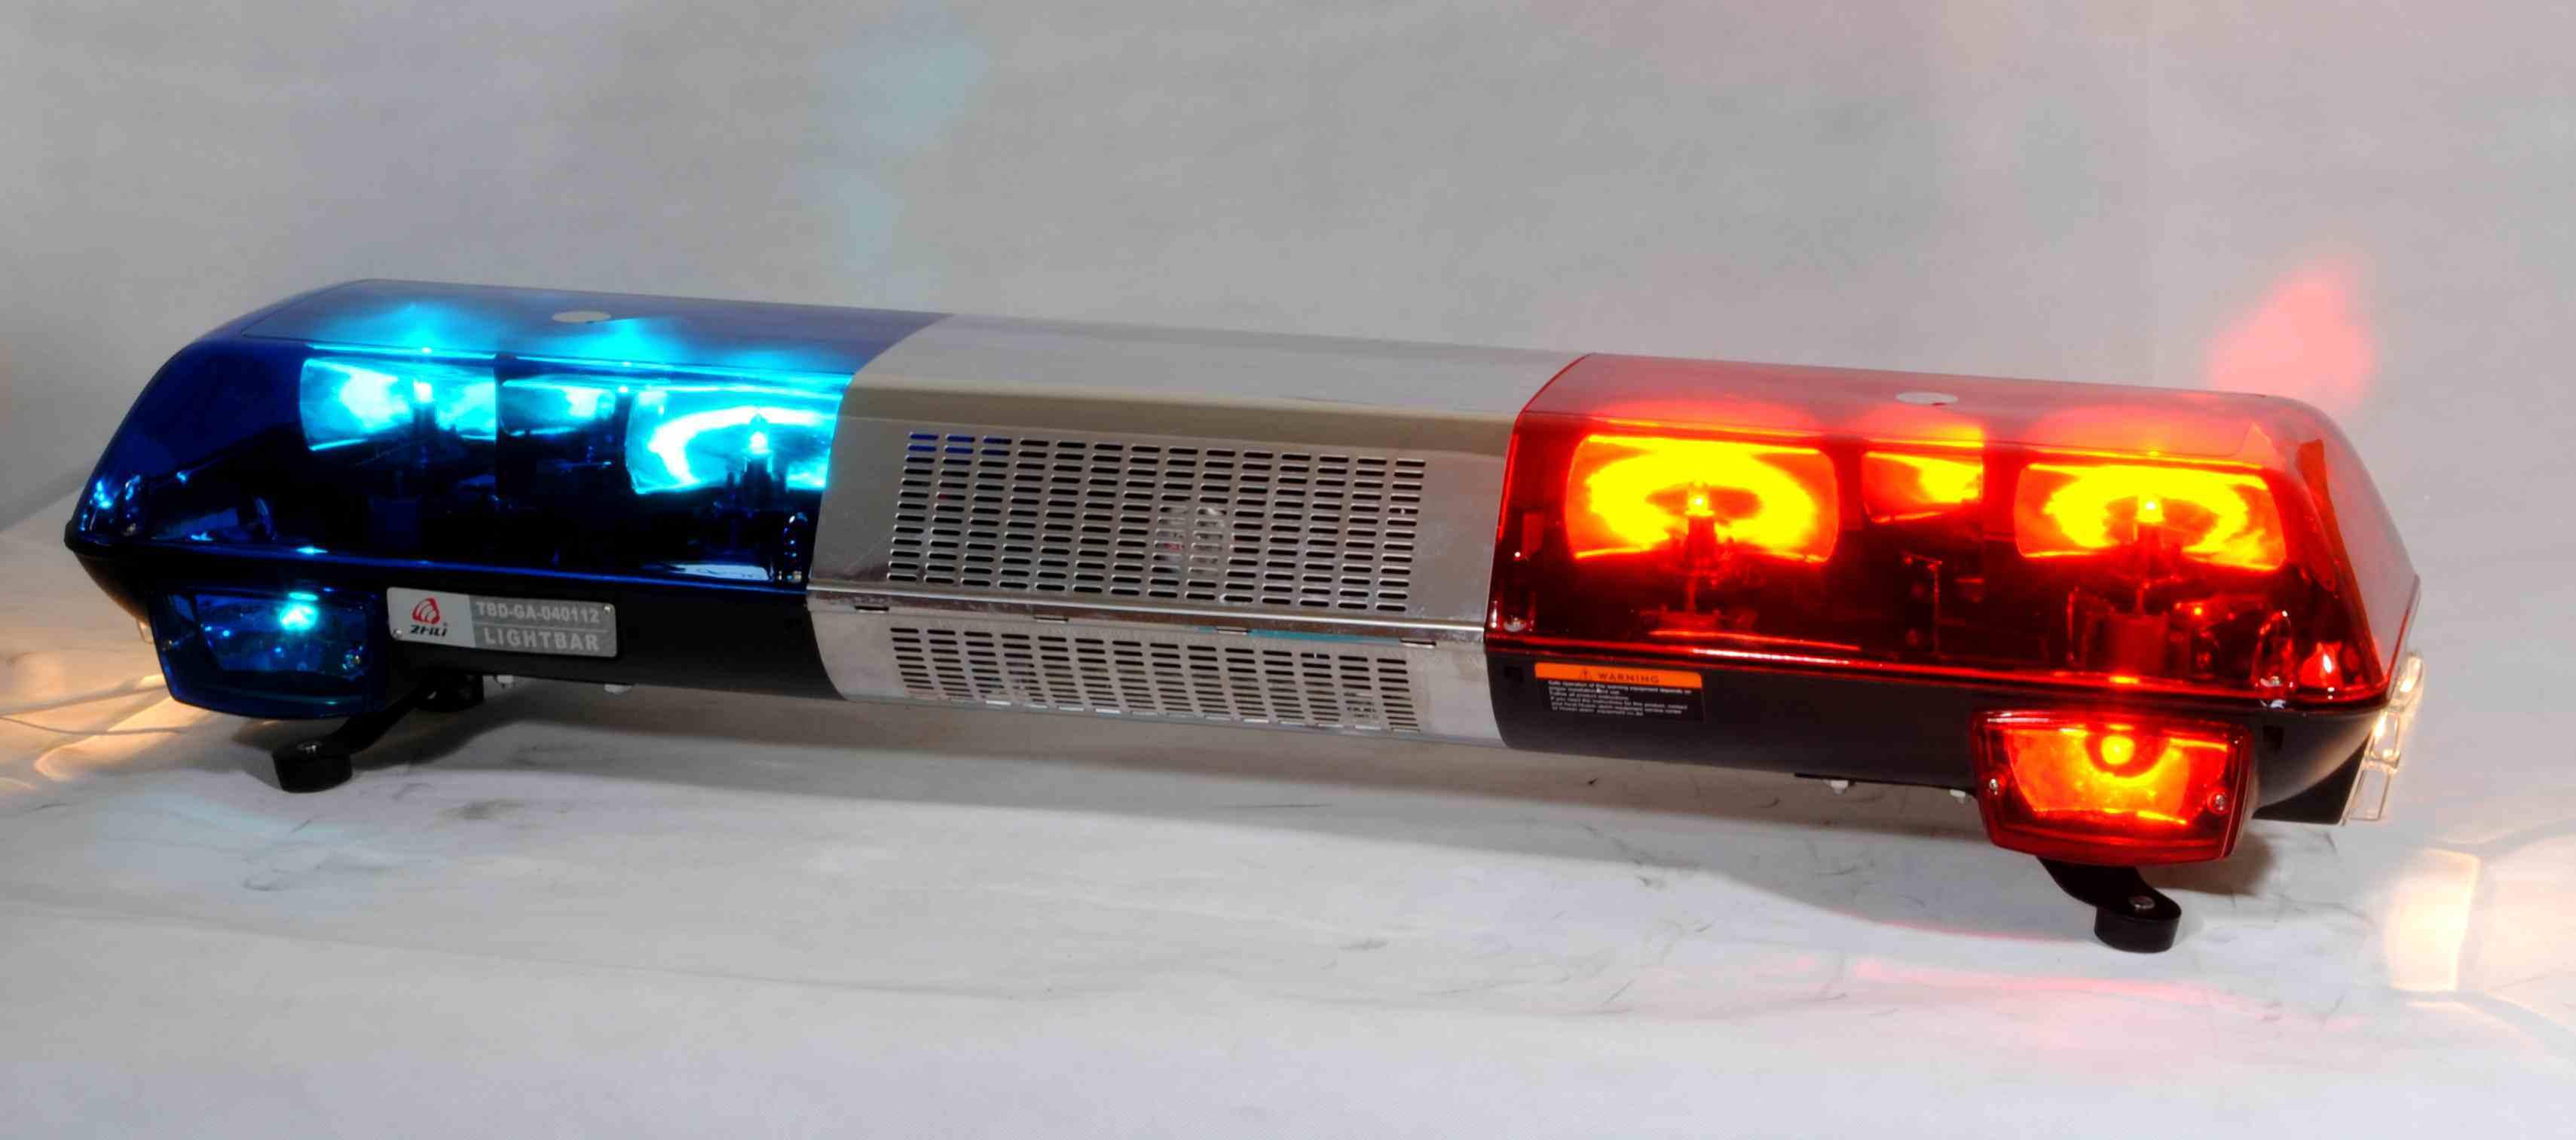 China rotating light bar for police vehicle tbd 040112 china china rotating light bar for police vehicle tbd 040112 china lightbar emergency lightbar aloadofball Choice Image